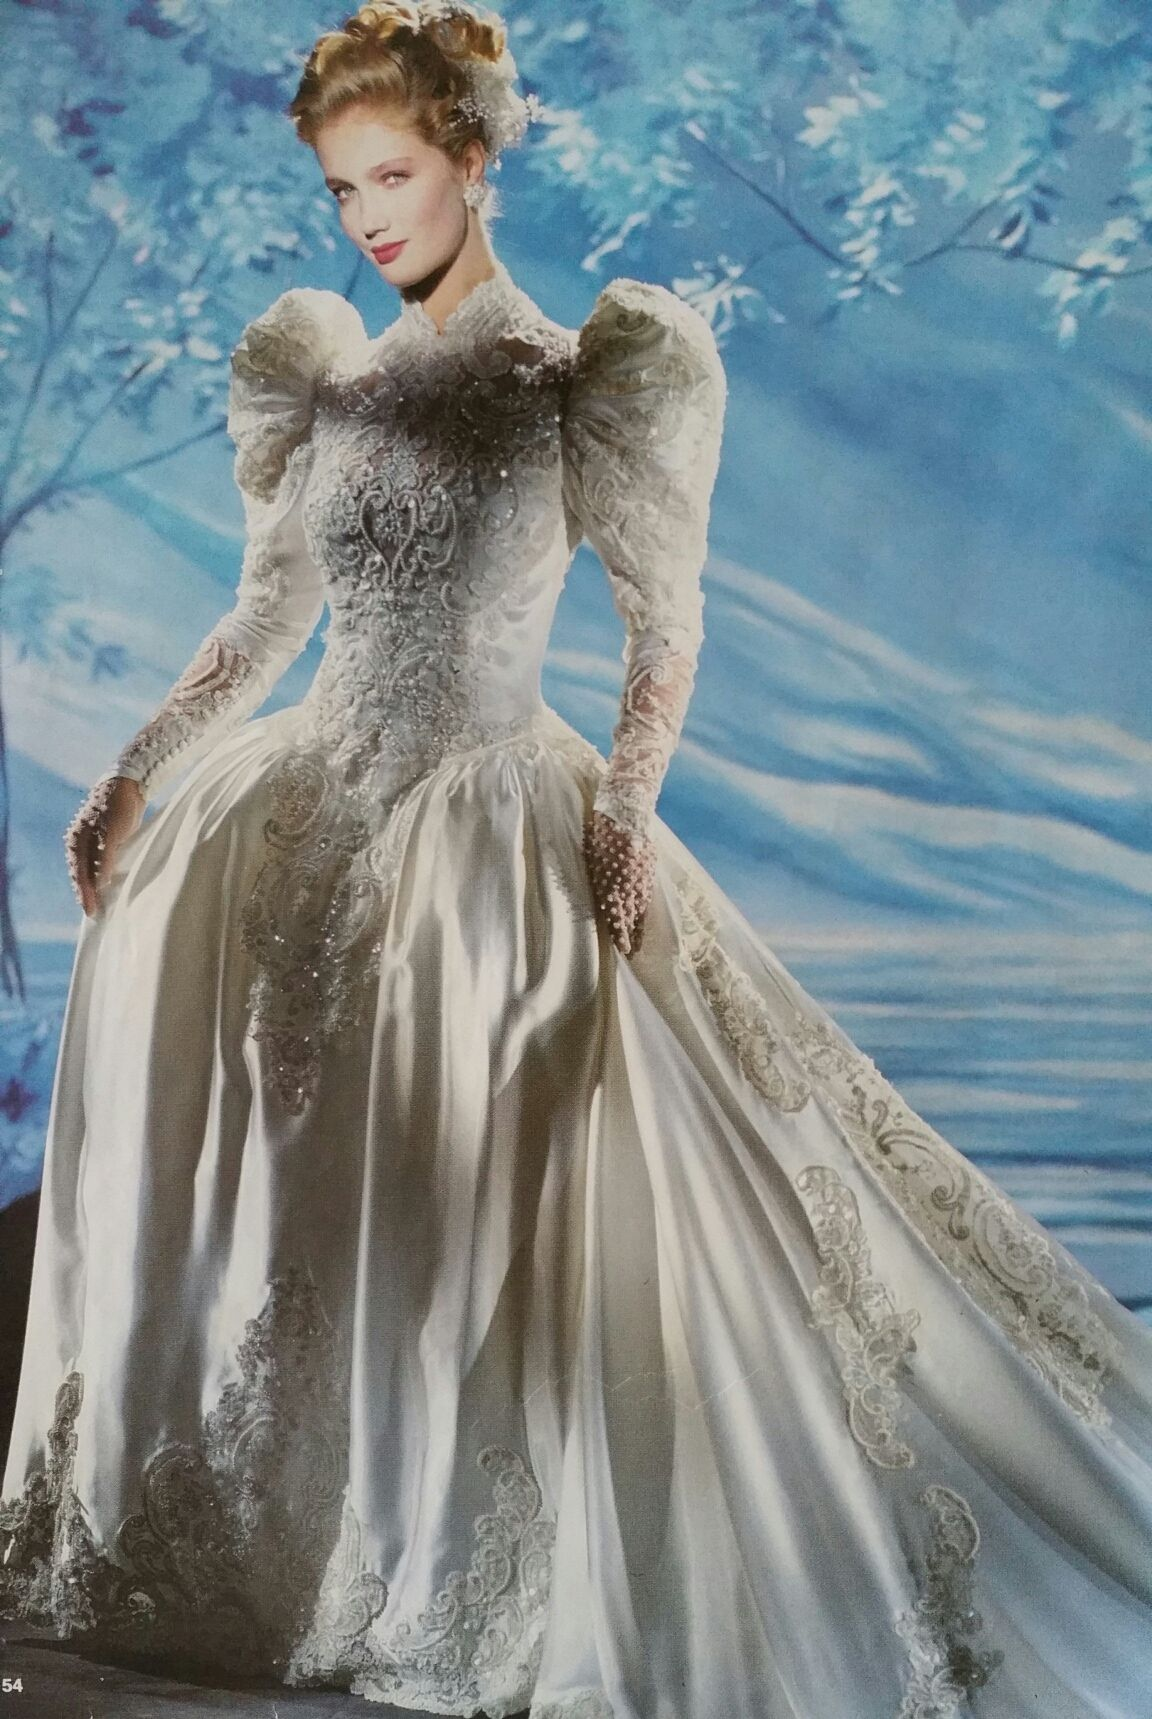 Demetrios Wedding Gowns 011 - Demetrios Wedding Gowns